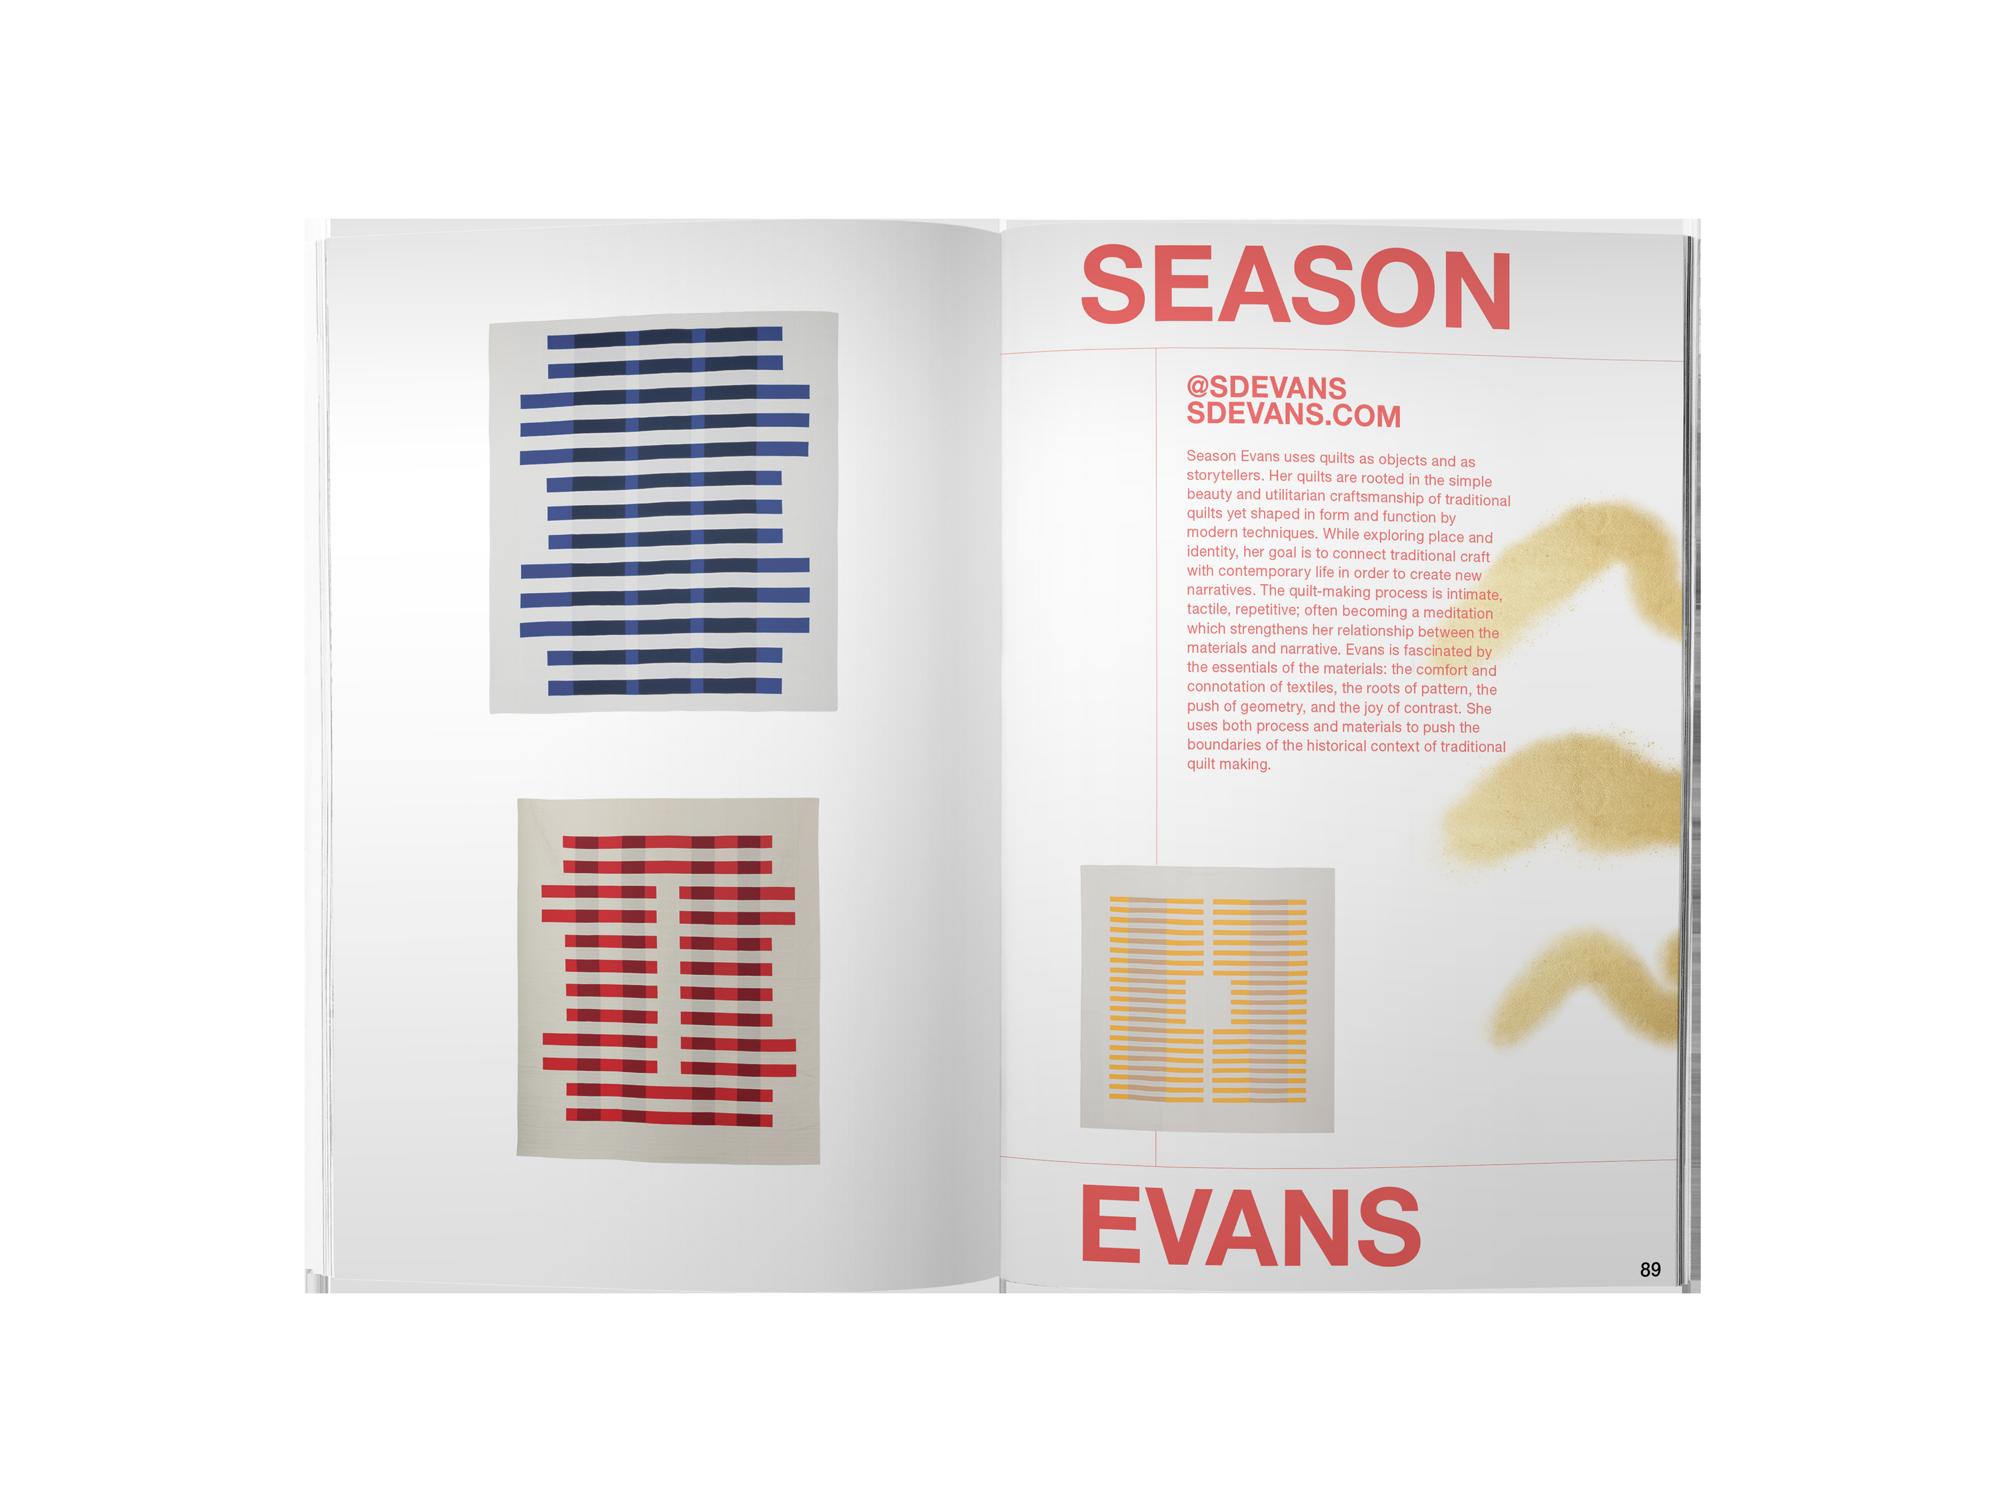 season-evans.png